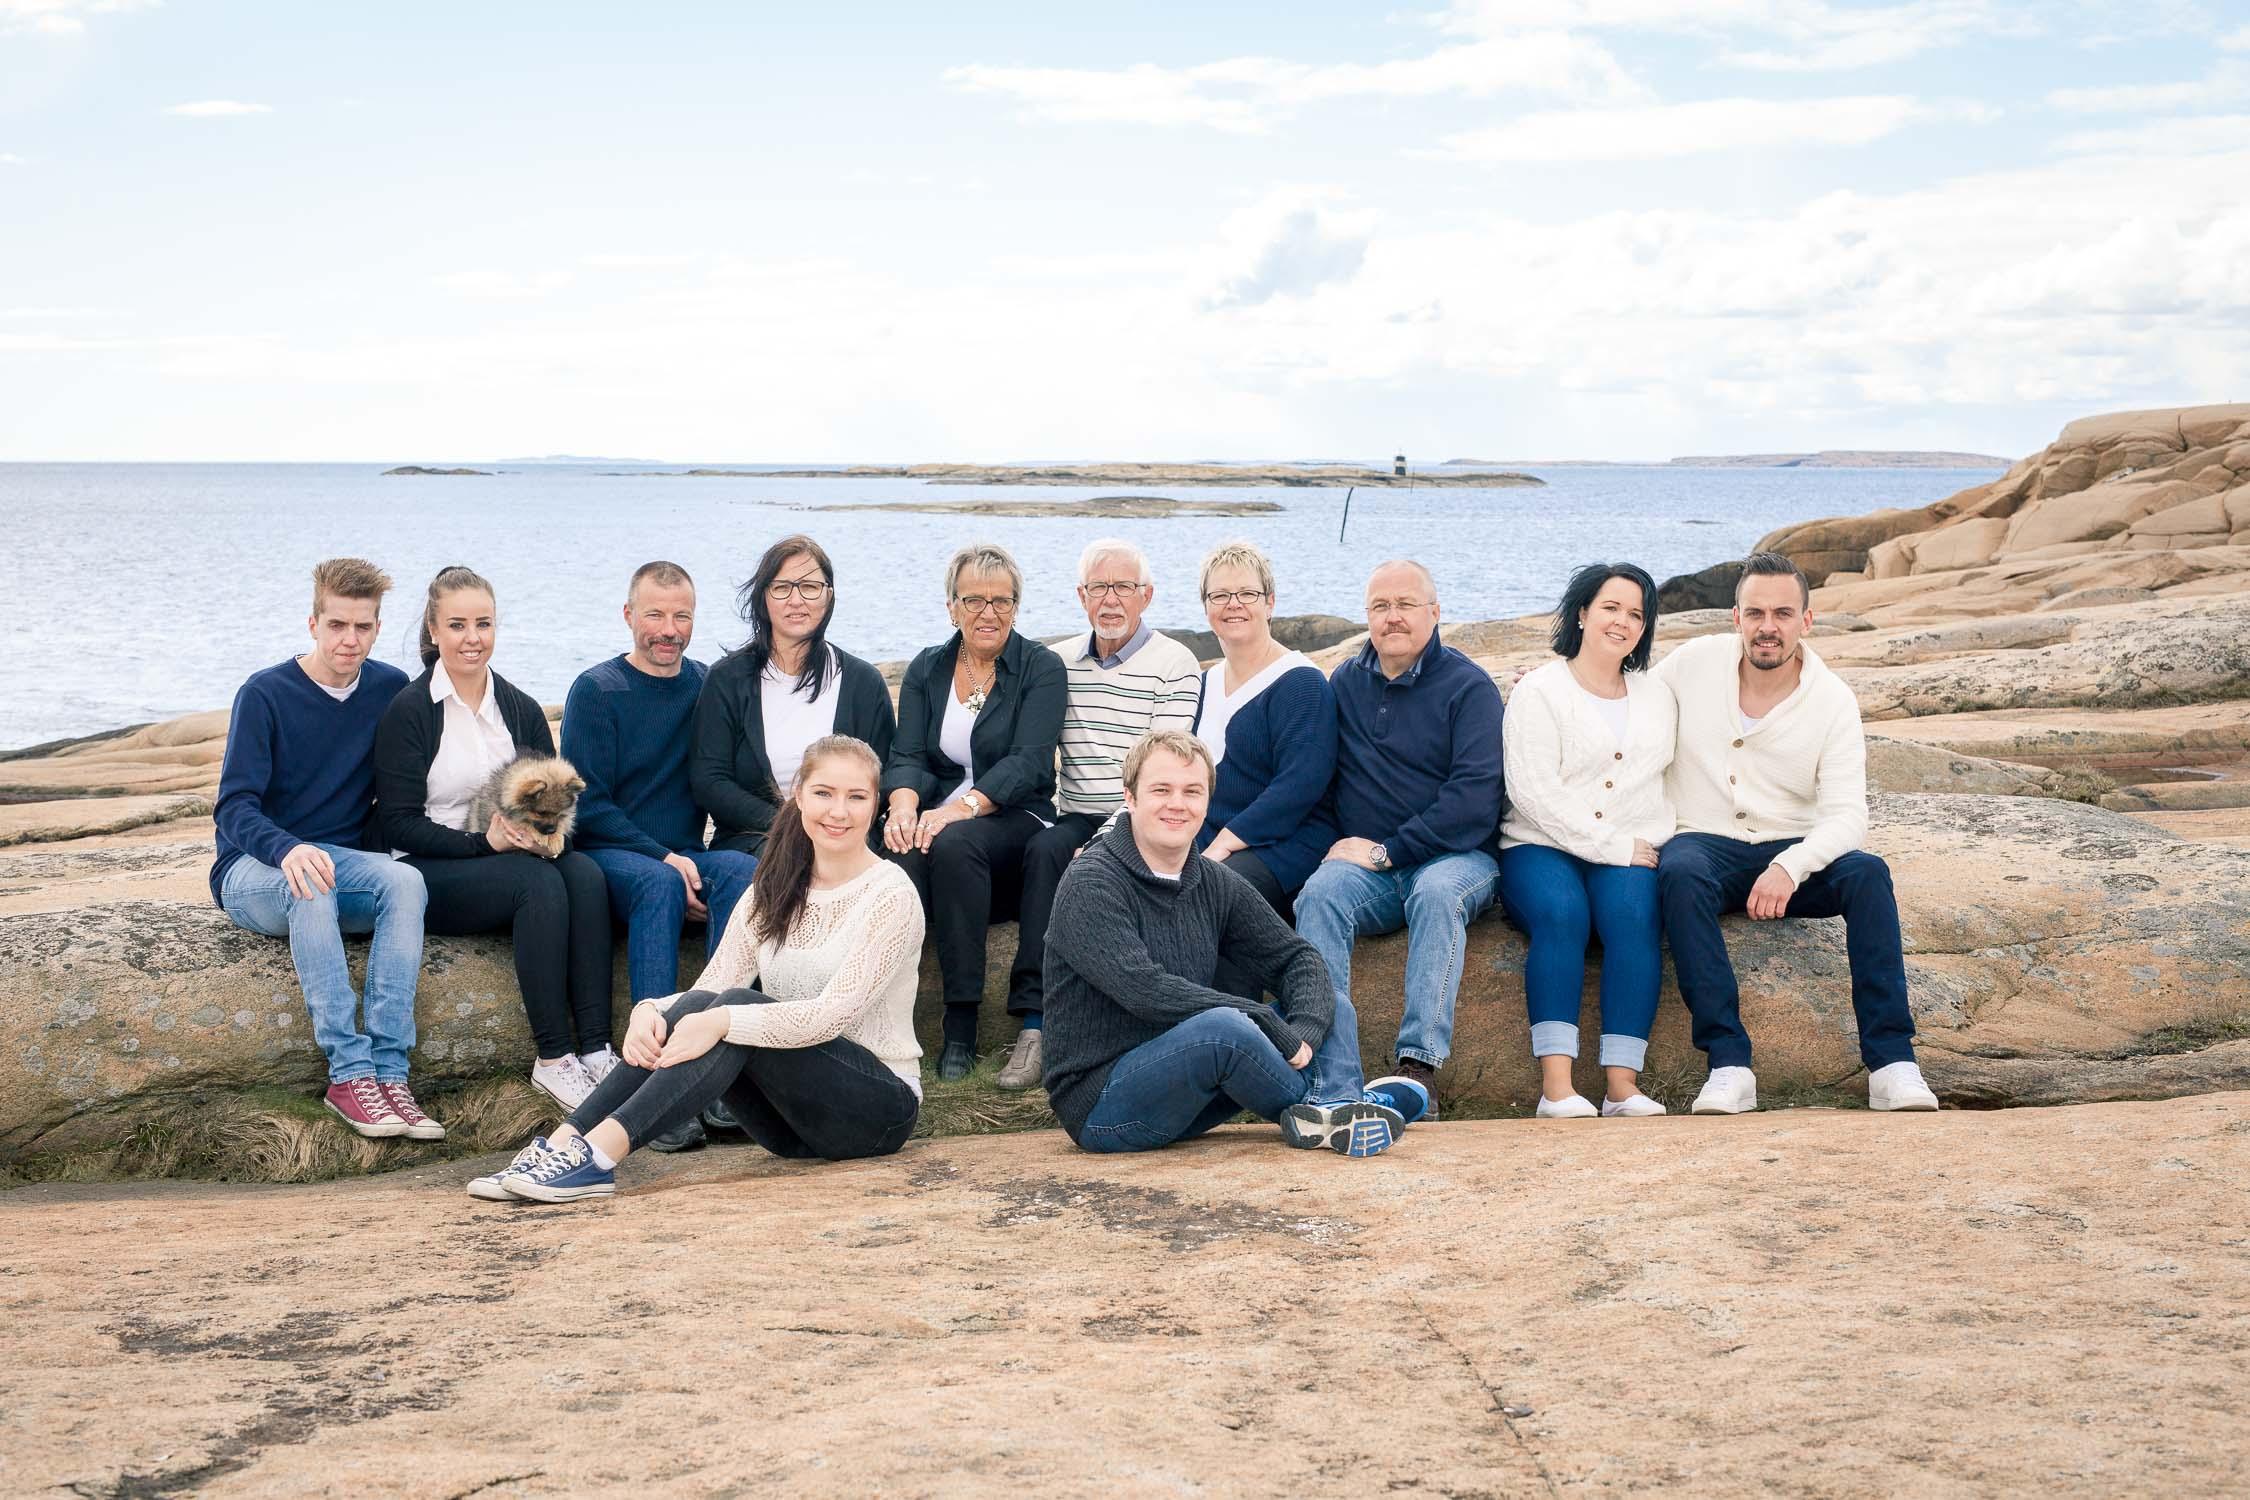 familie-familiefotograf-familiefotografering-hodne-design-hodnedesign-pål-hodne--5.jpg